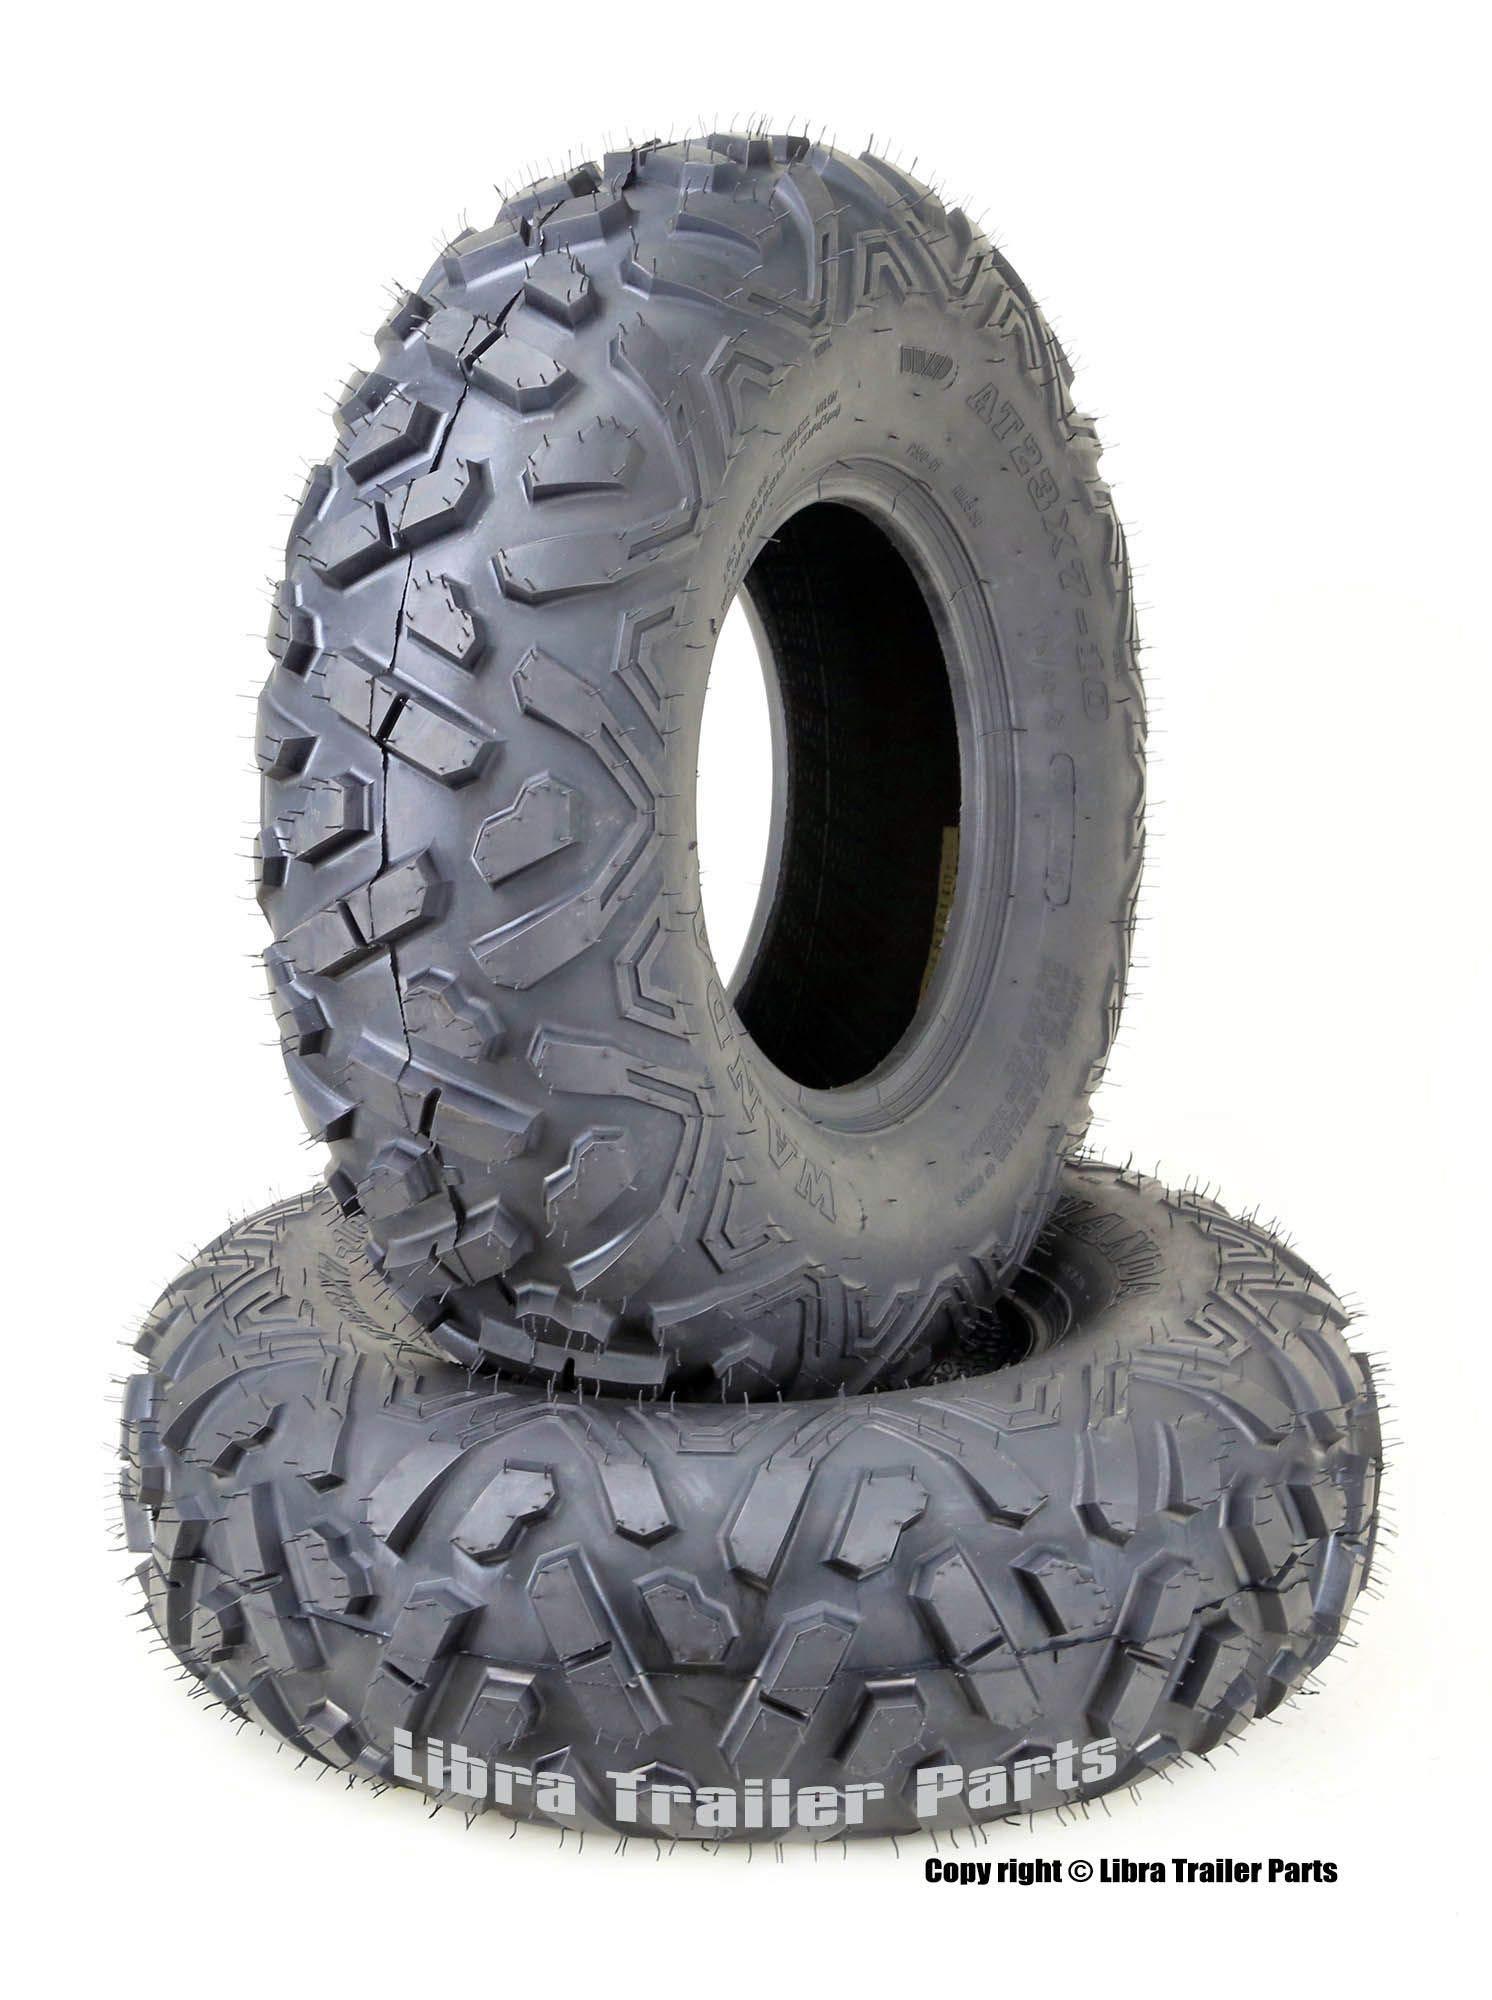 Set of 2 WANDA ATV Tires 23x7-10 23x7x10 4PR Big Horn Style